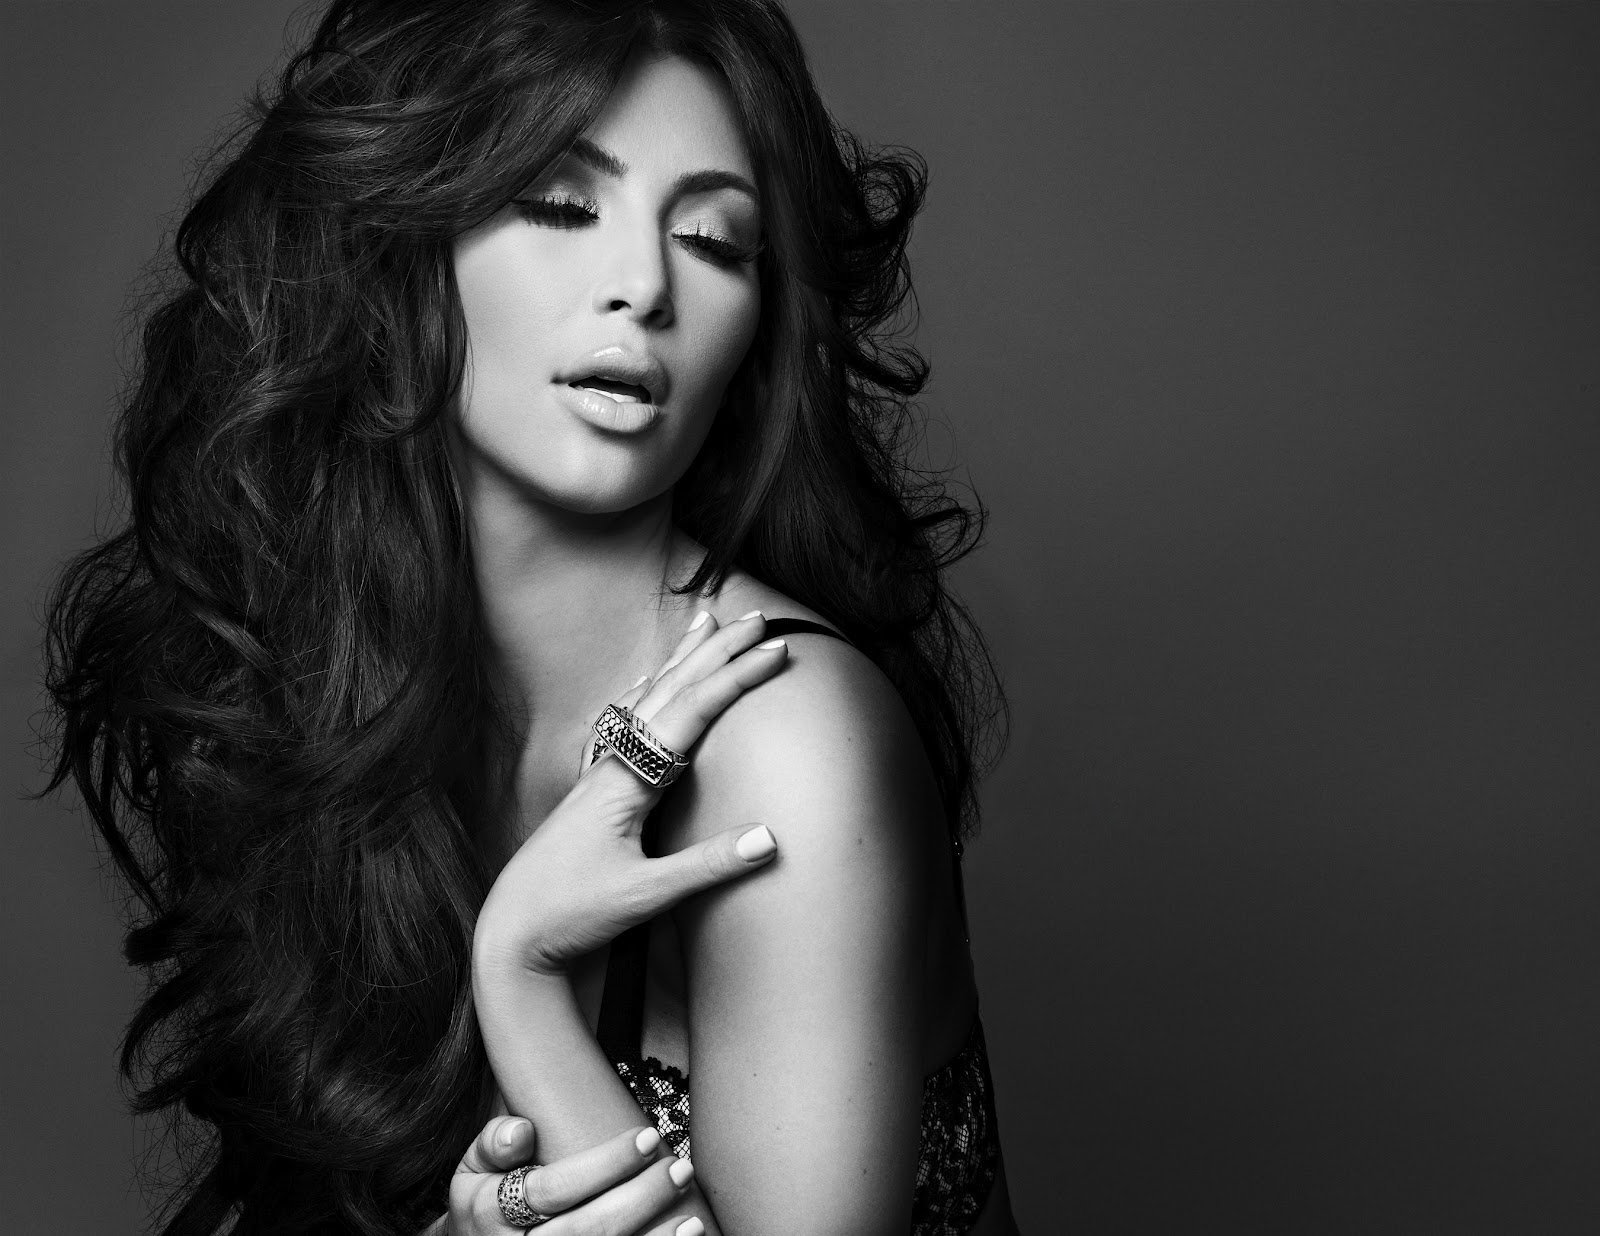 http://1.bp.blogspot.com/-KN6IglAaNsc/UGSe6Ev5nNI/AAAAAAABA7A/sglPCP4M-Zg/s1600/Kim+Kardashian+lingerie+photo+(4).jpg